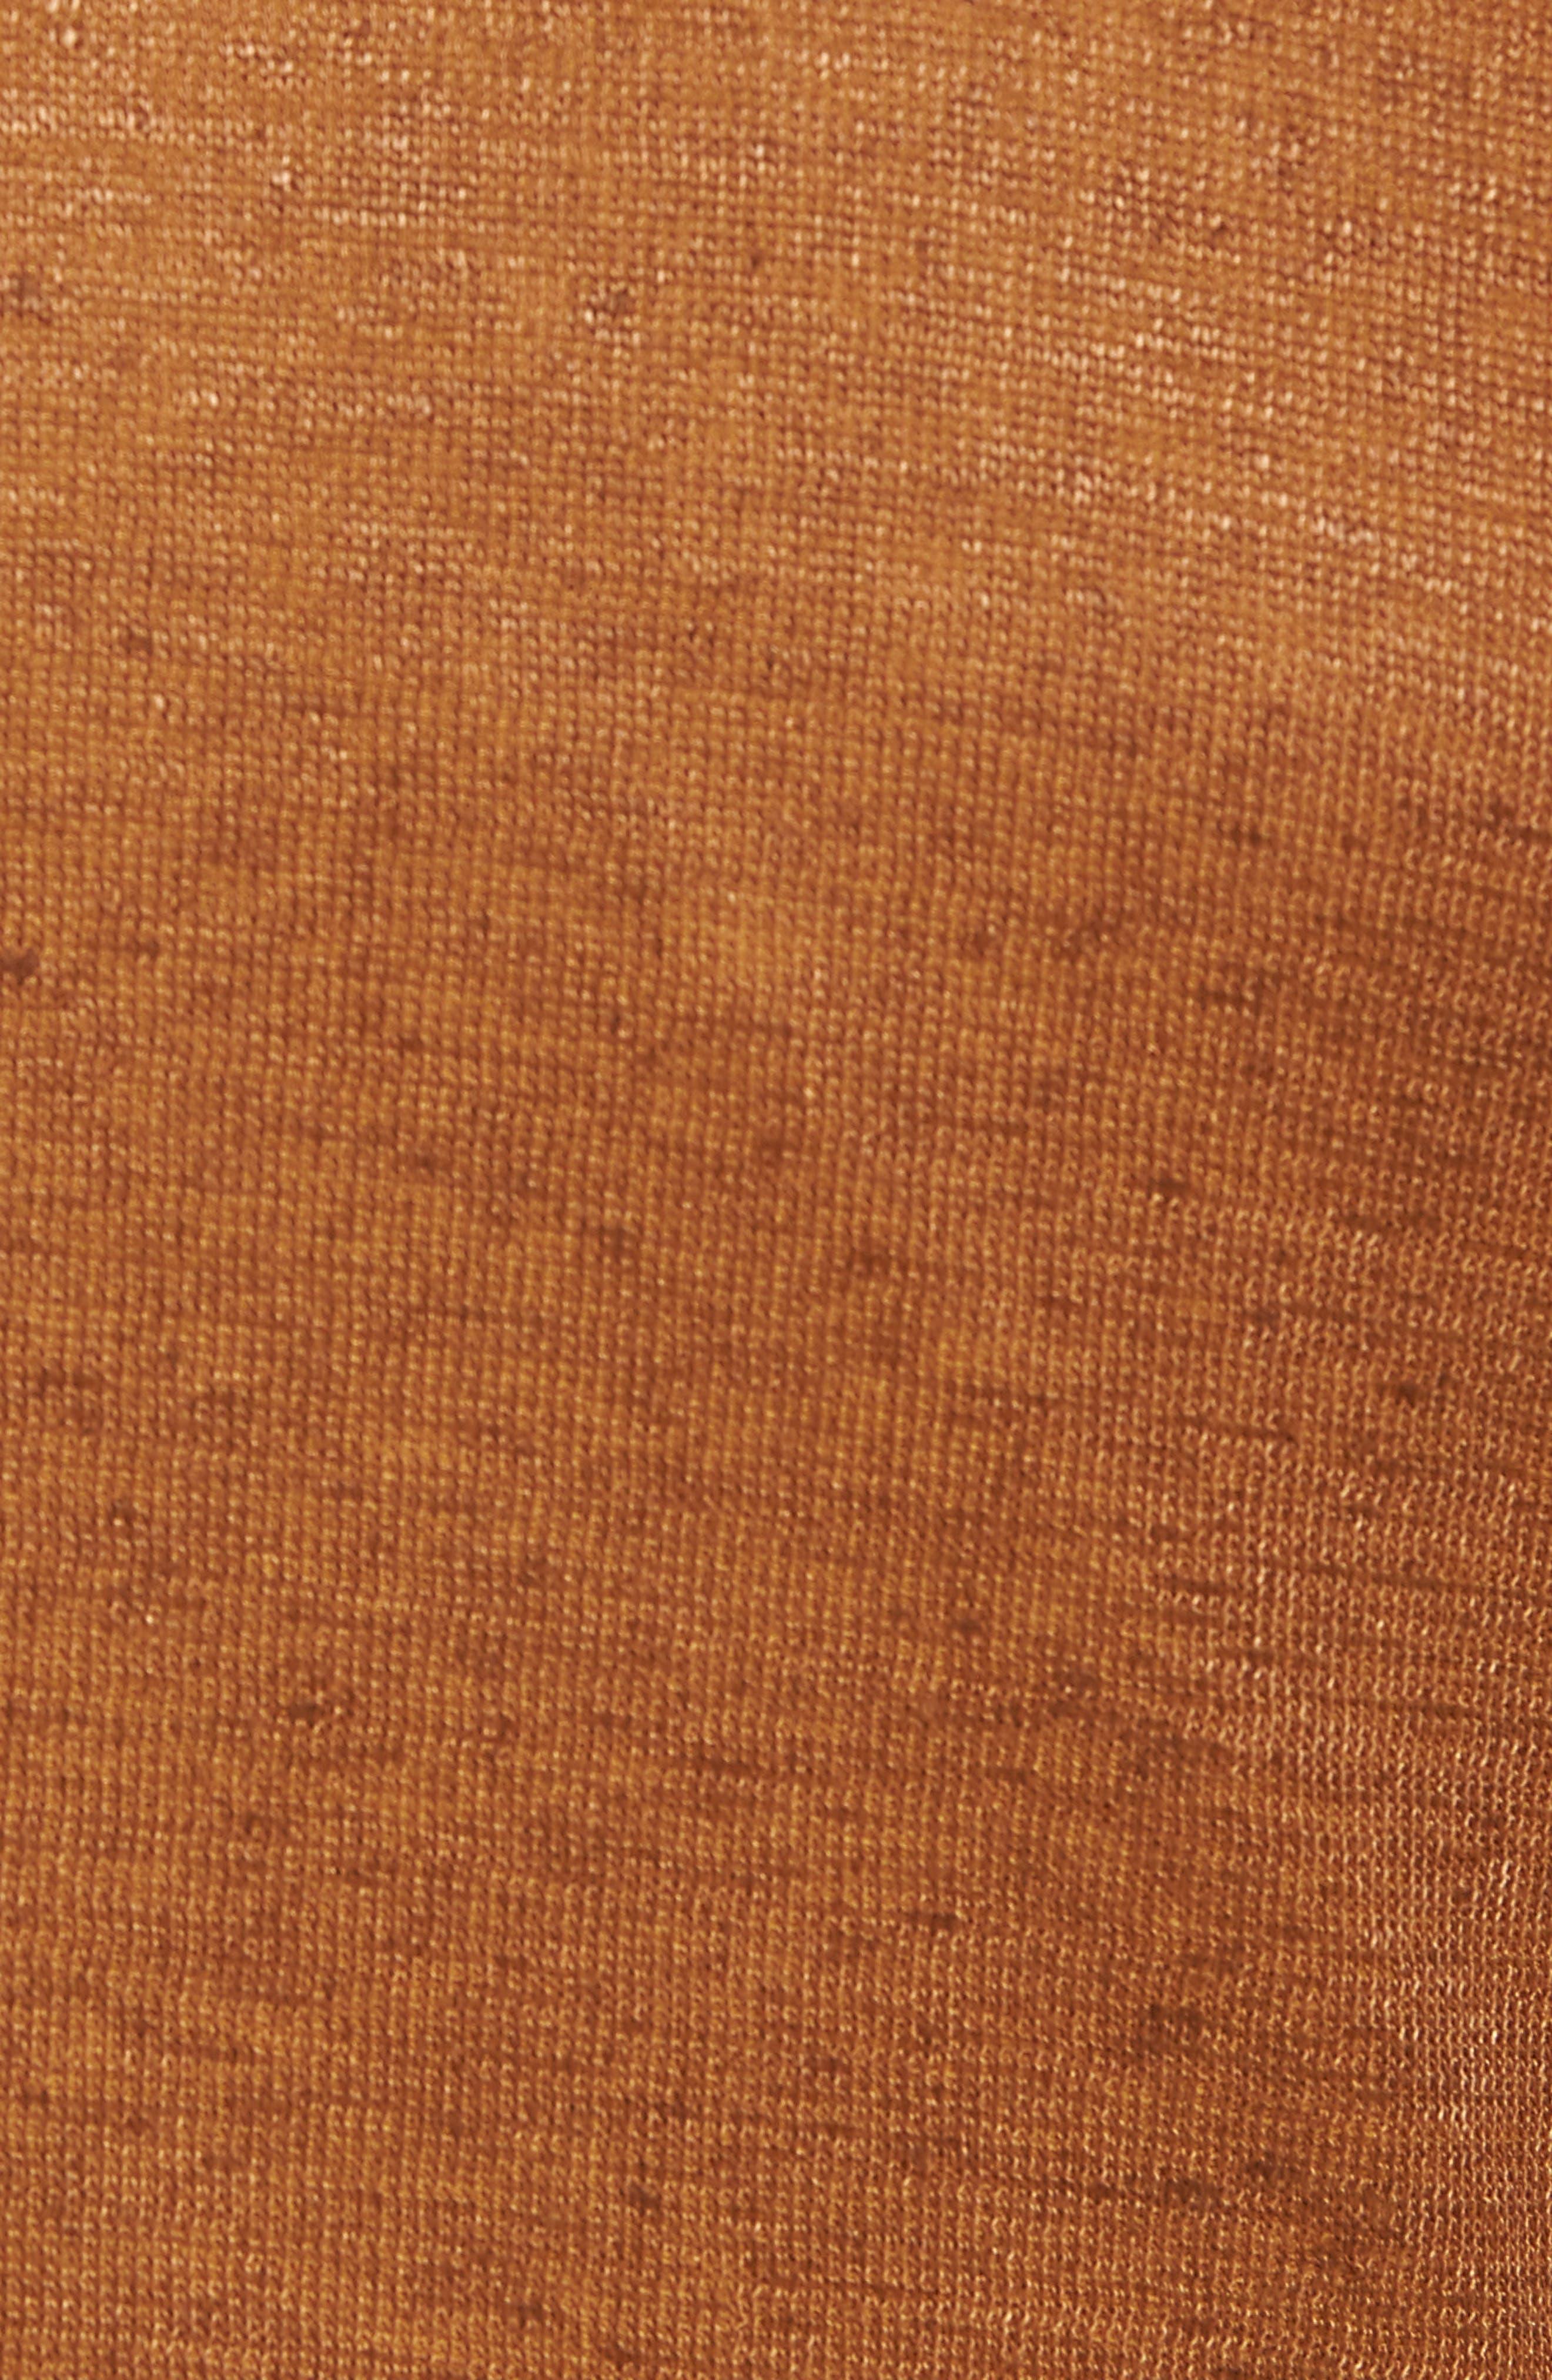 Trim Fit Heathered Jersey Blazer,                             Alternate thumbnail 5, color,                             Burnt Sienna